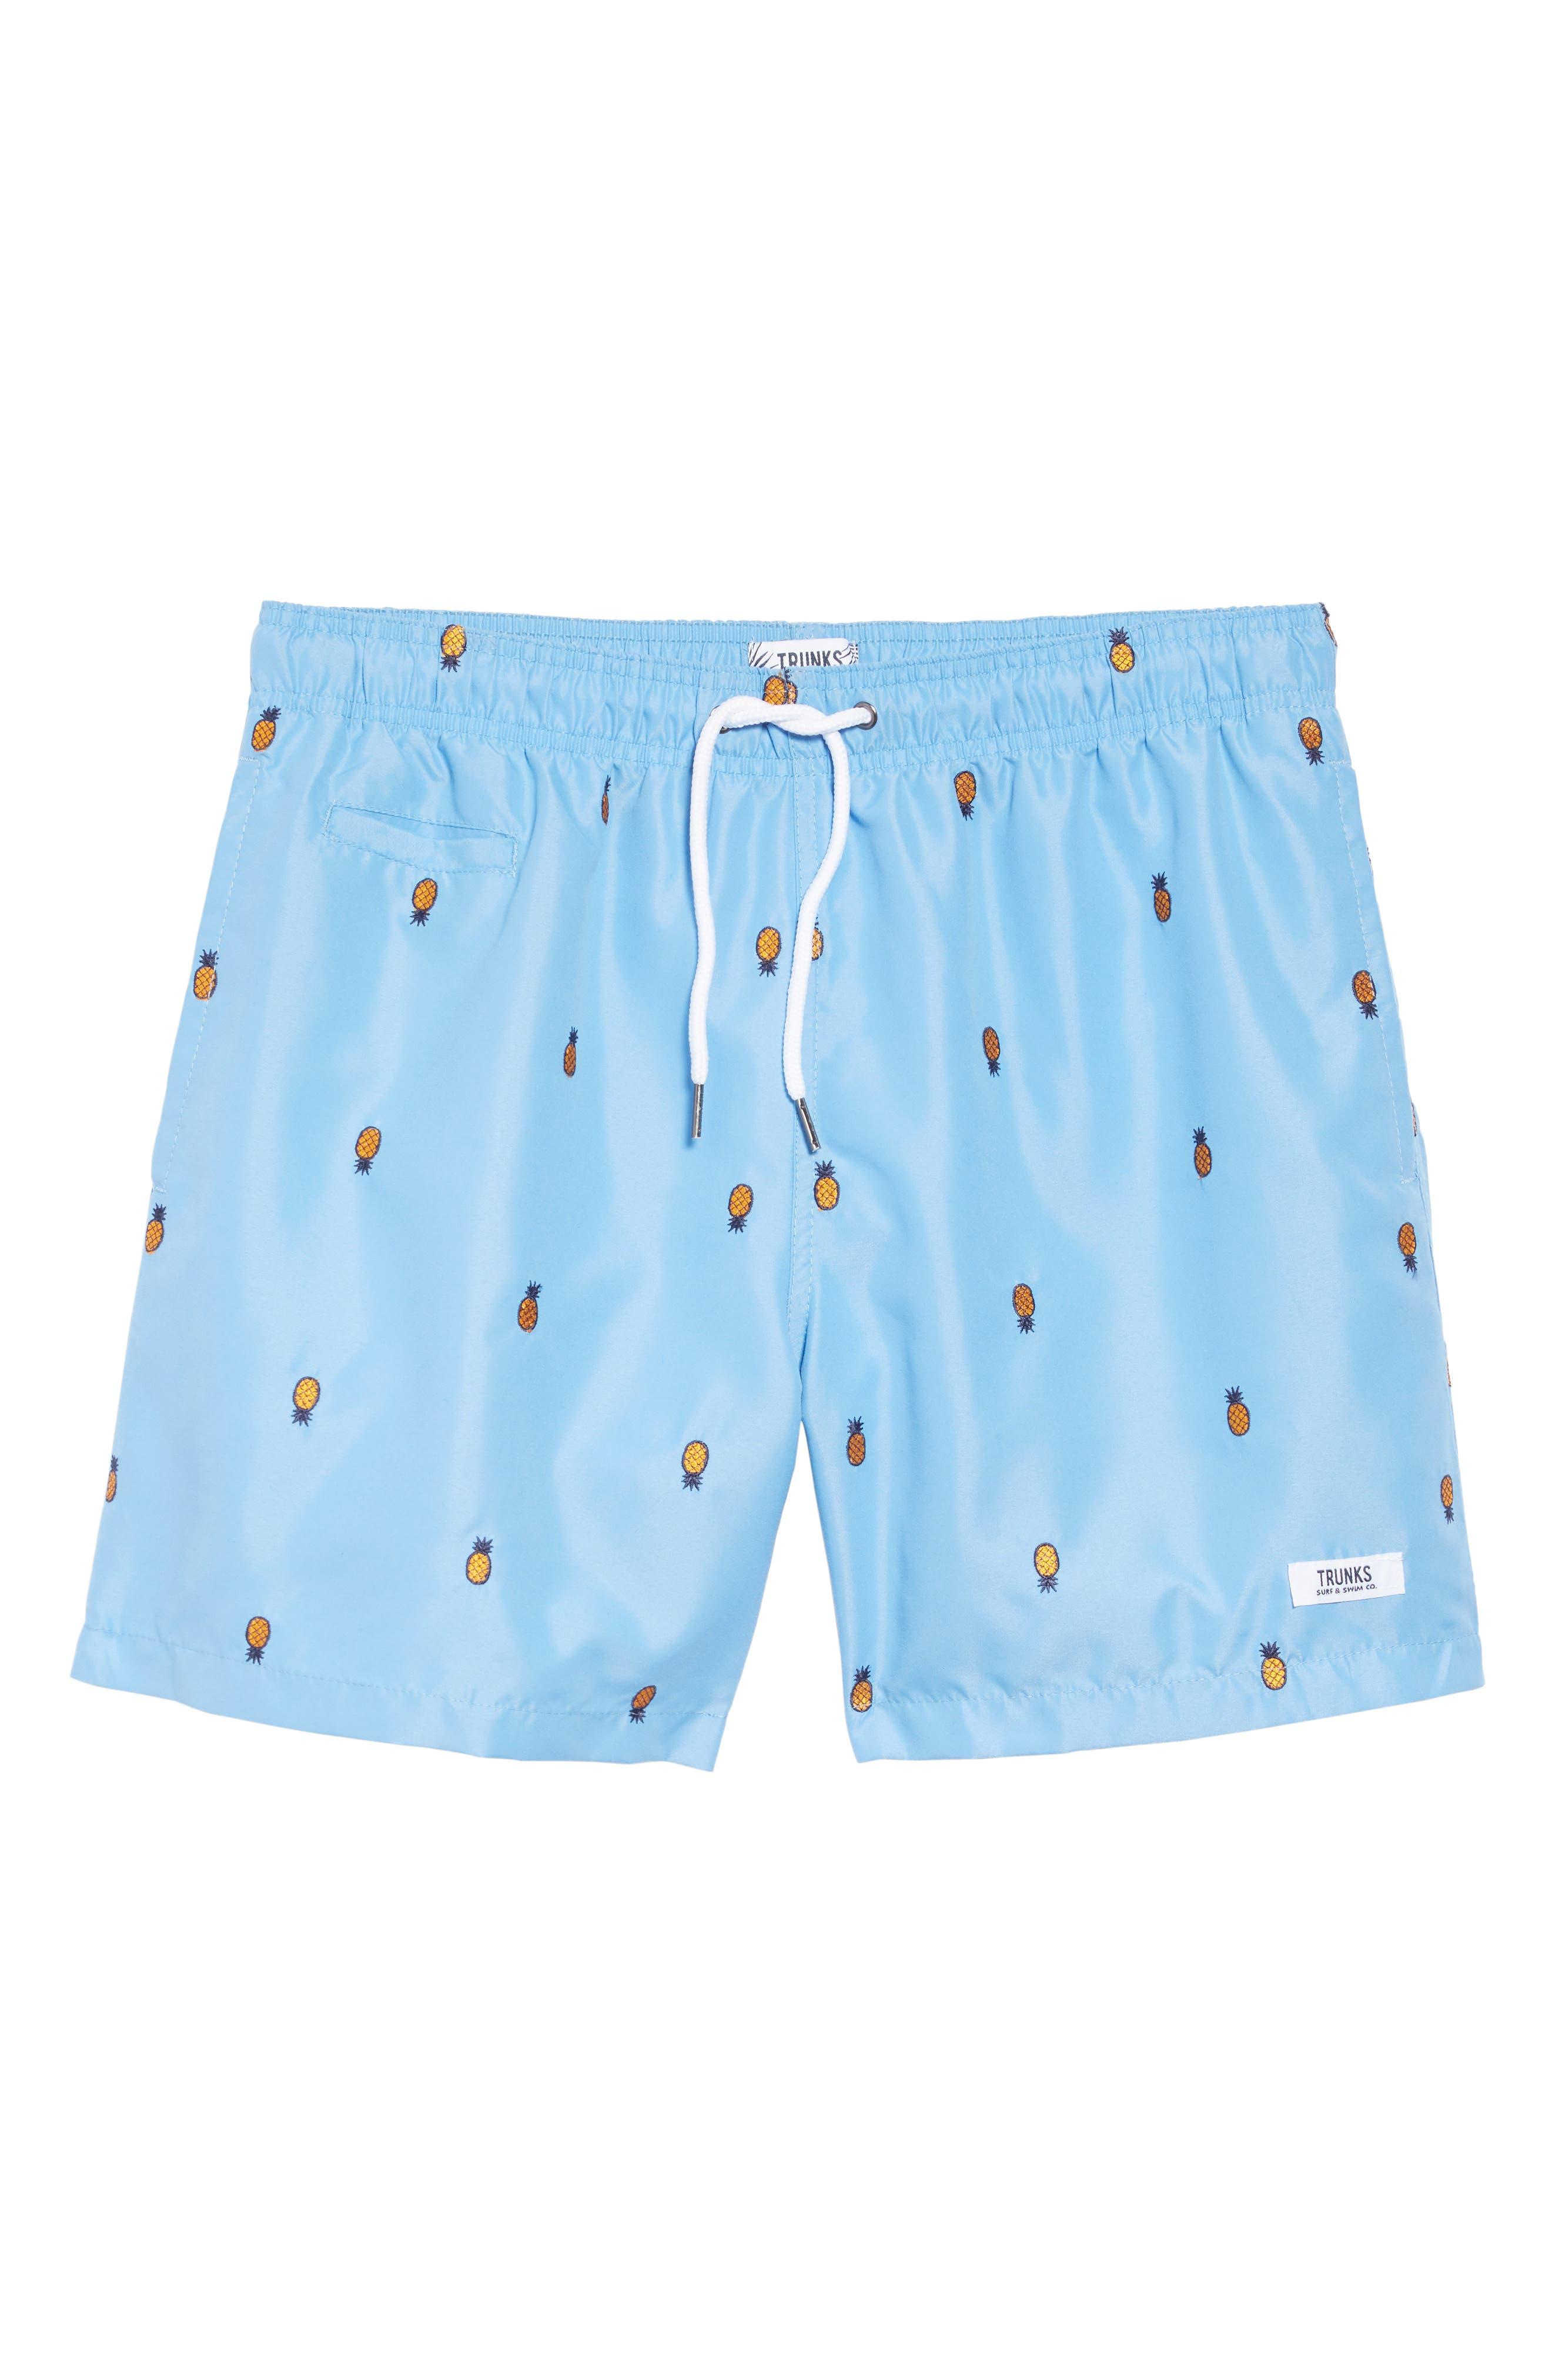 Premium Embroidered Sano Swim Trunks,                             Alternate thumbnail 6, color,                             PERISIAN BLUE